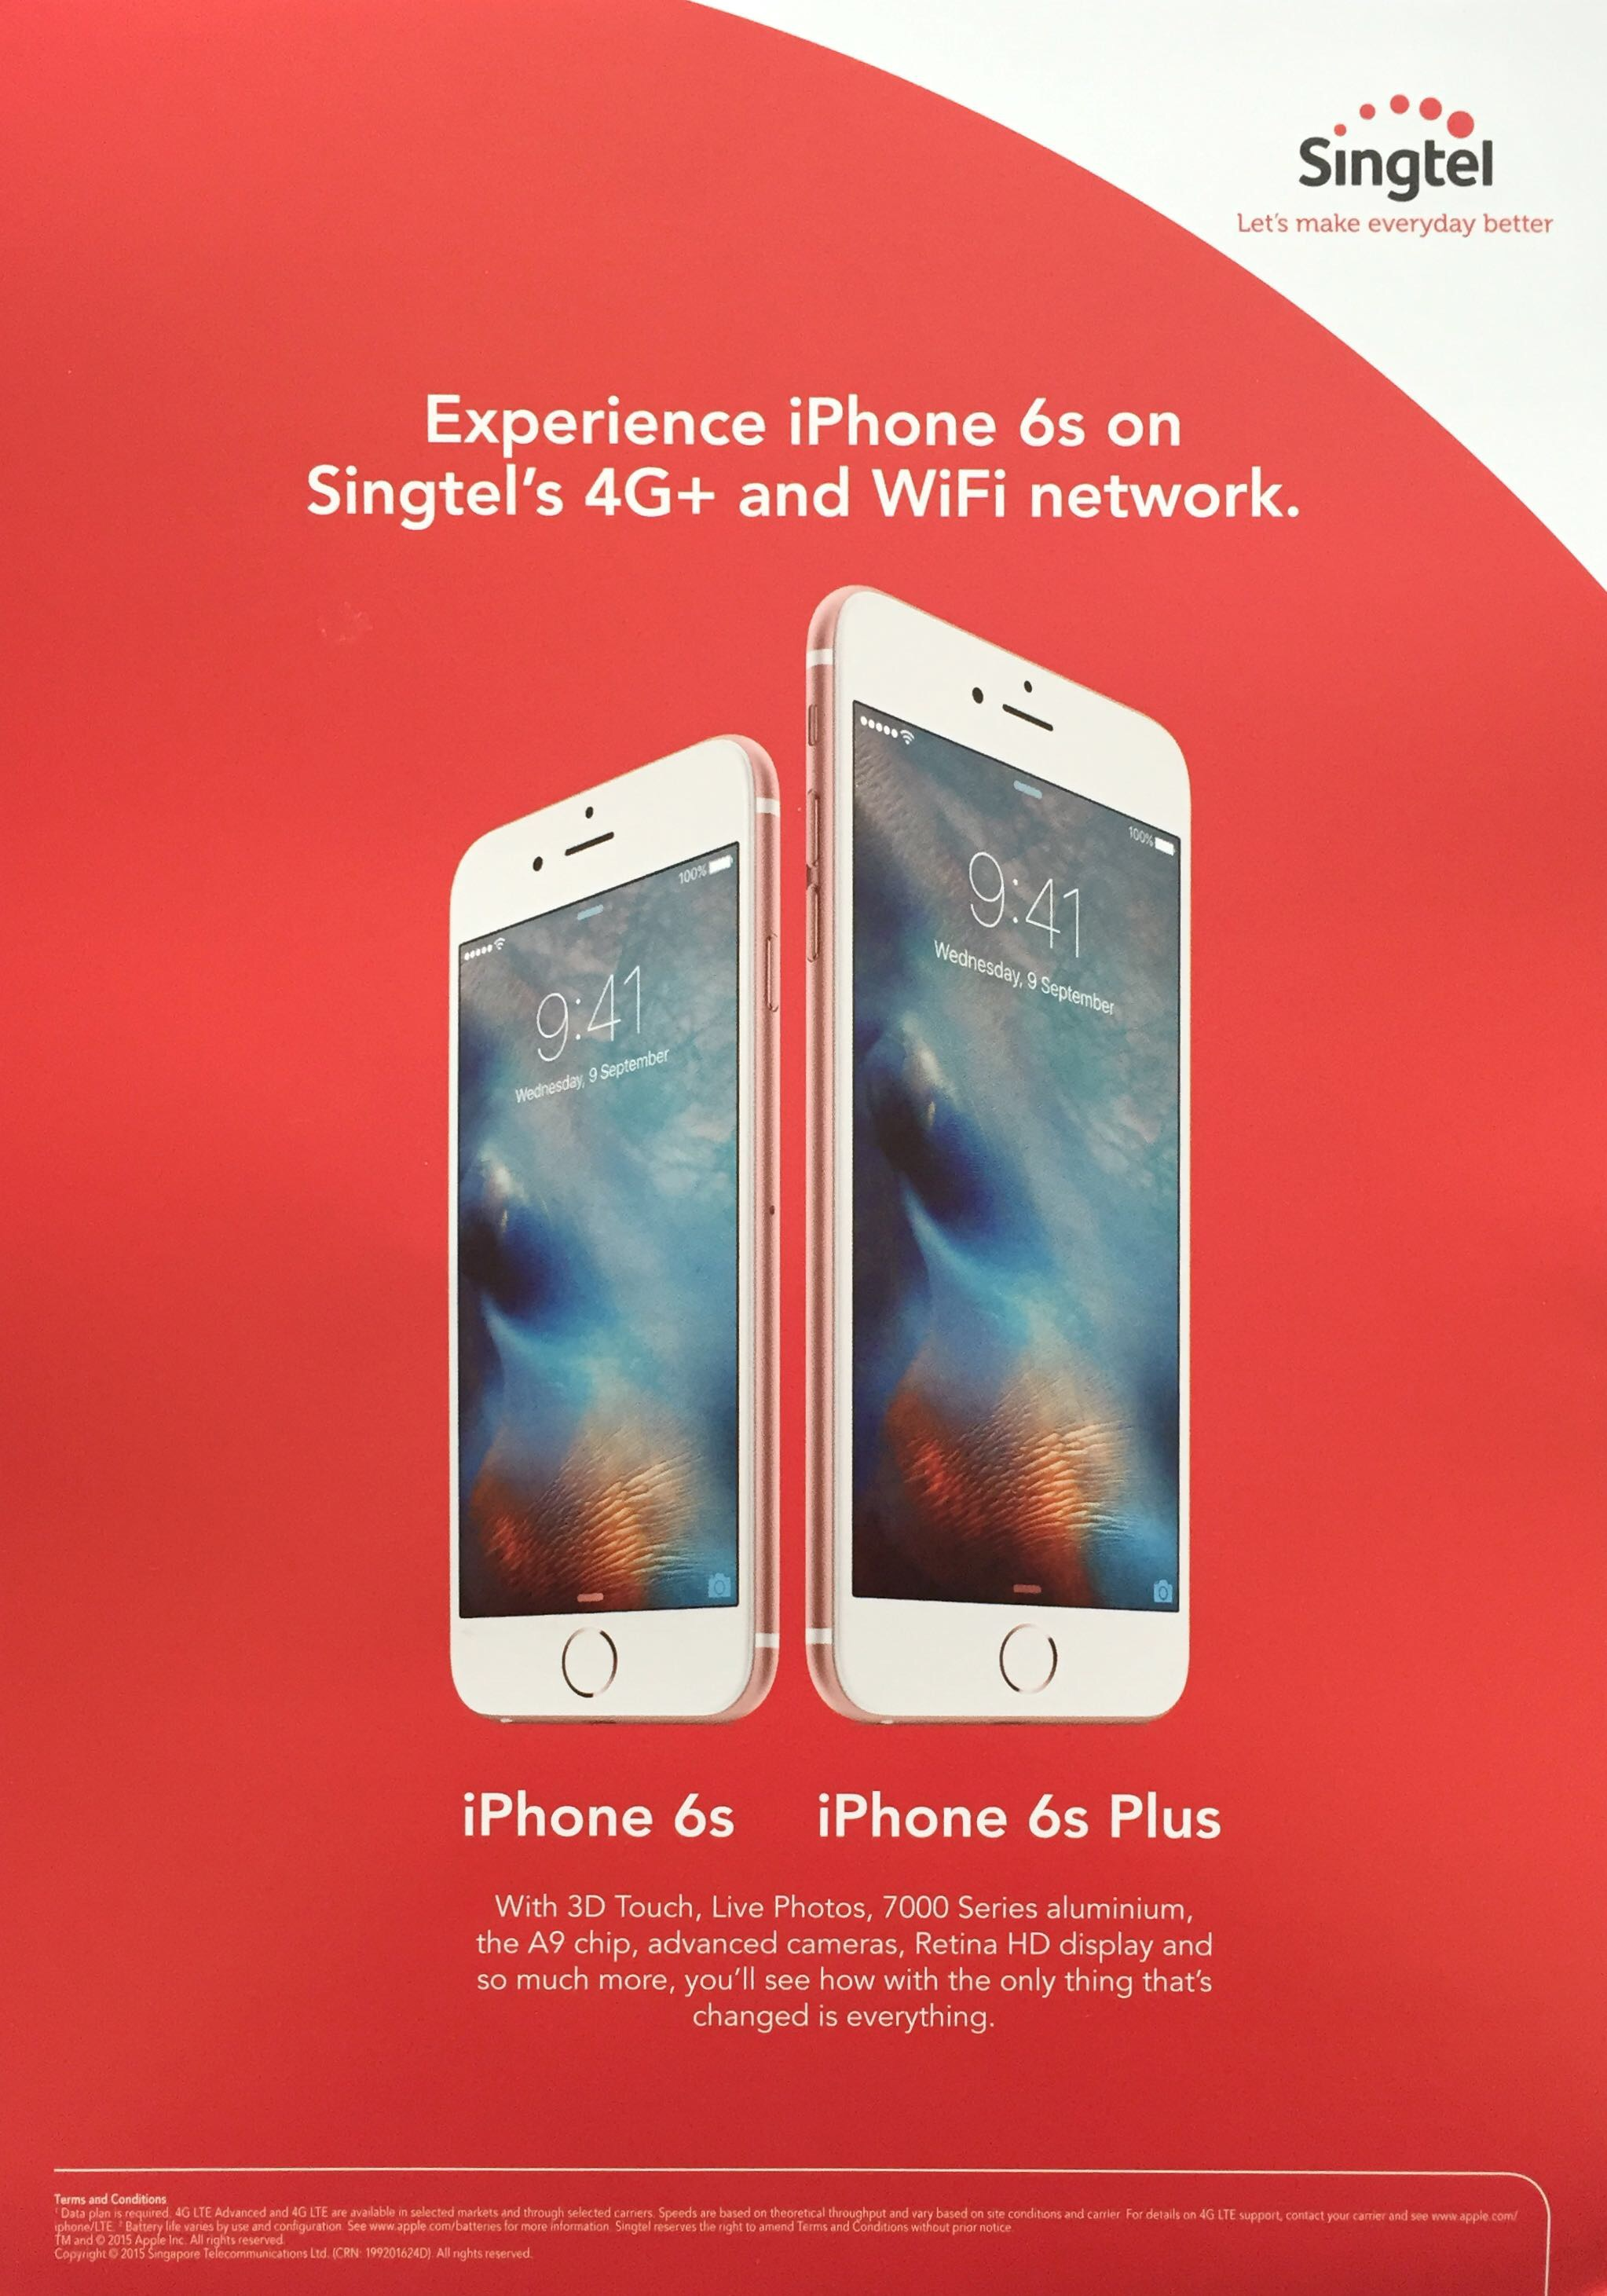 Singtel @ SITEX 2015 - iPhone 6S / 6S Plus